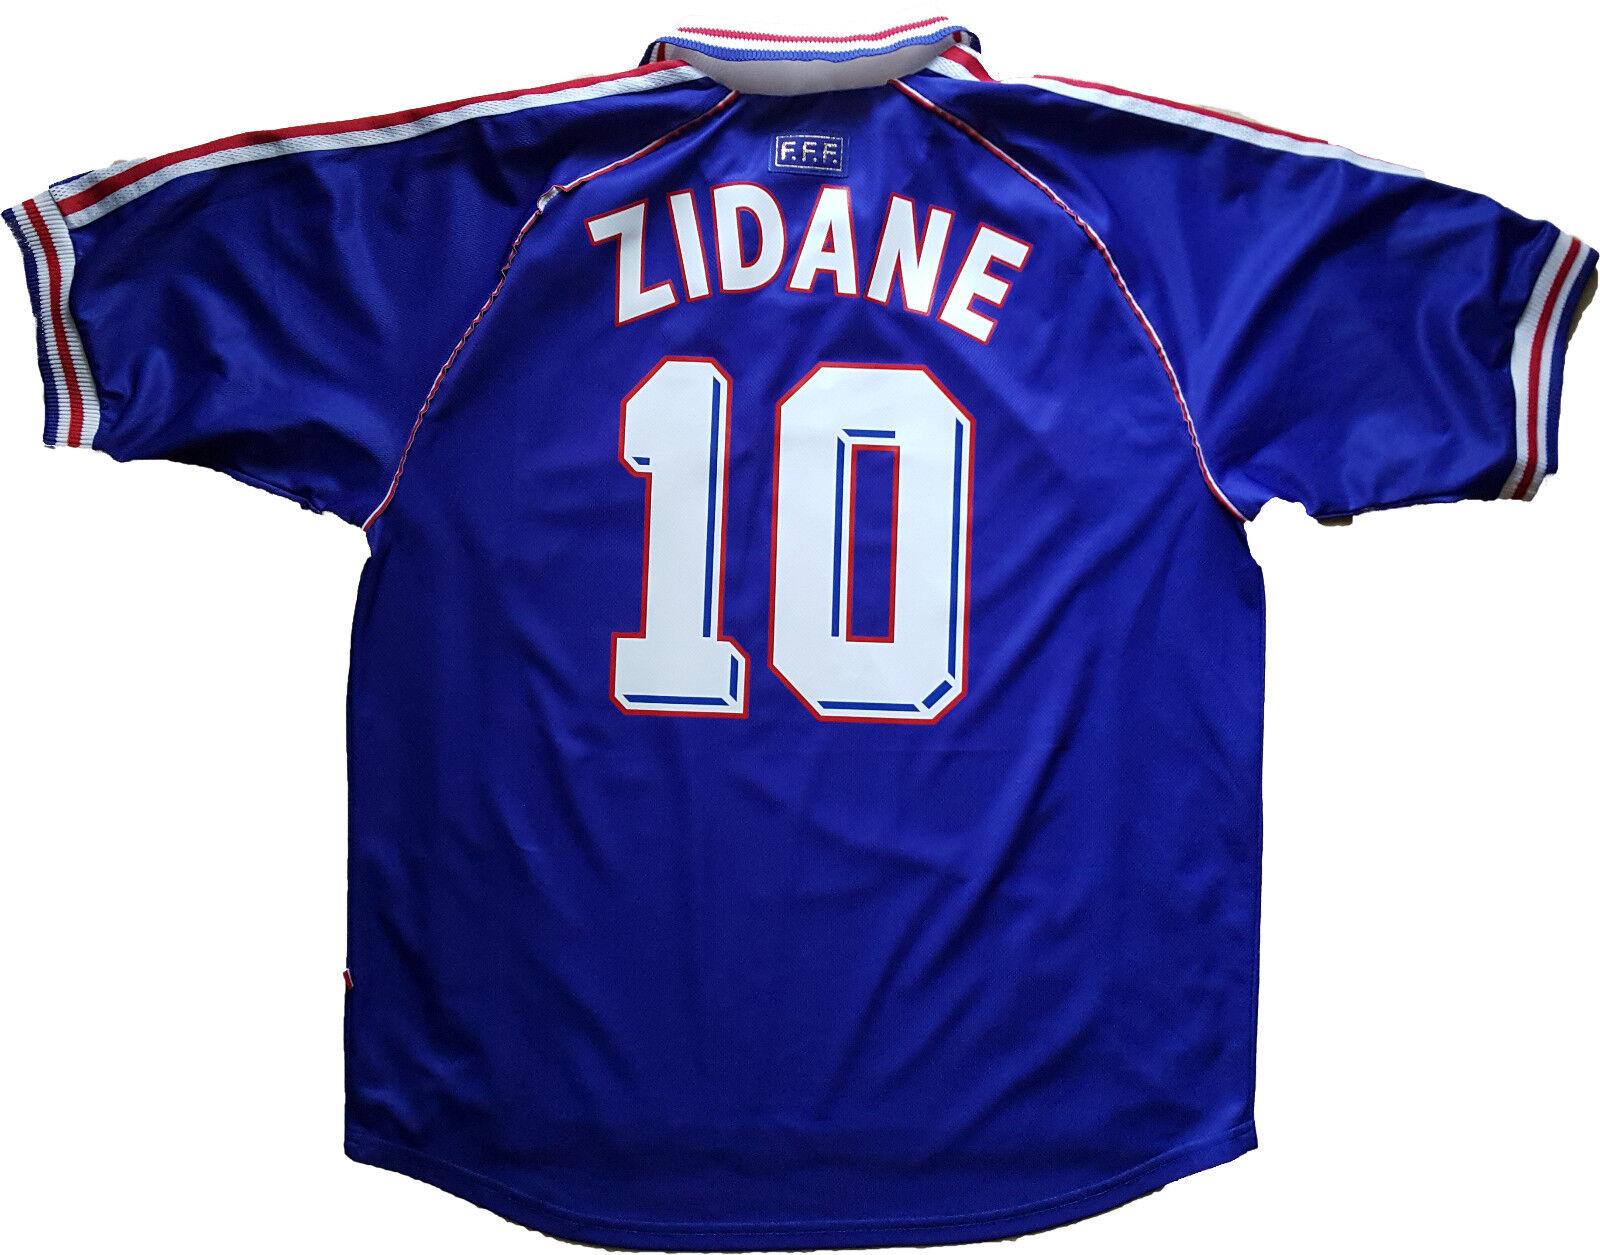 Maglia Francia Zidane 1998 World Cup 98 Vintage Adidas shirt Jersey home XS